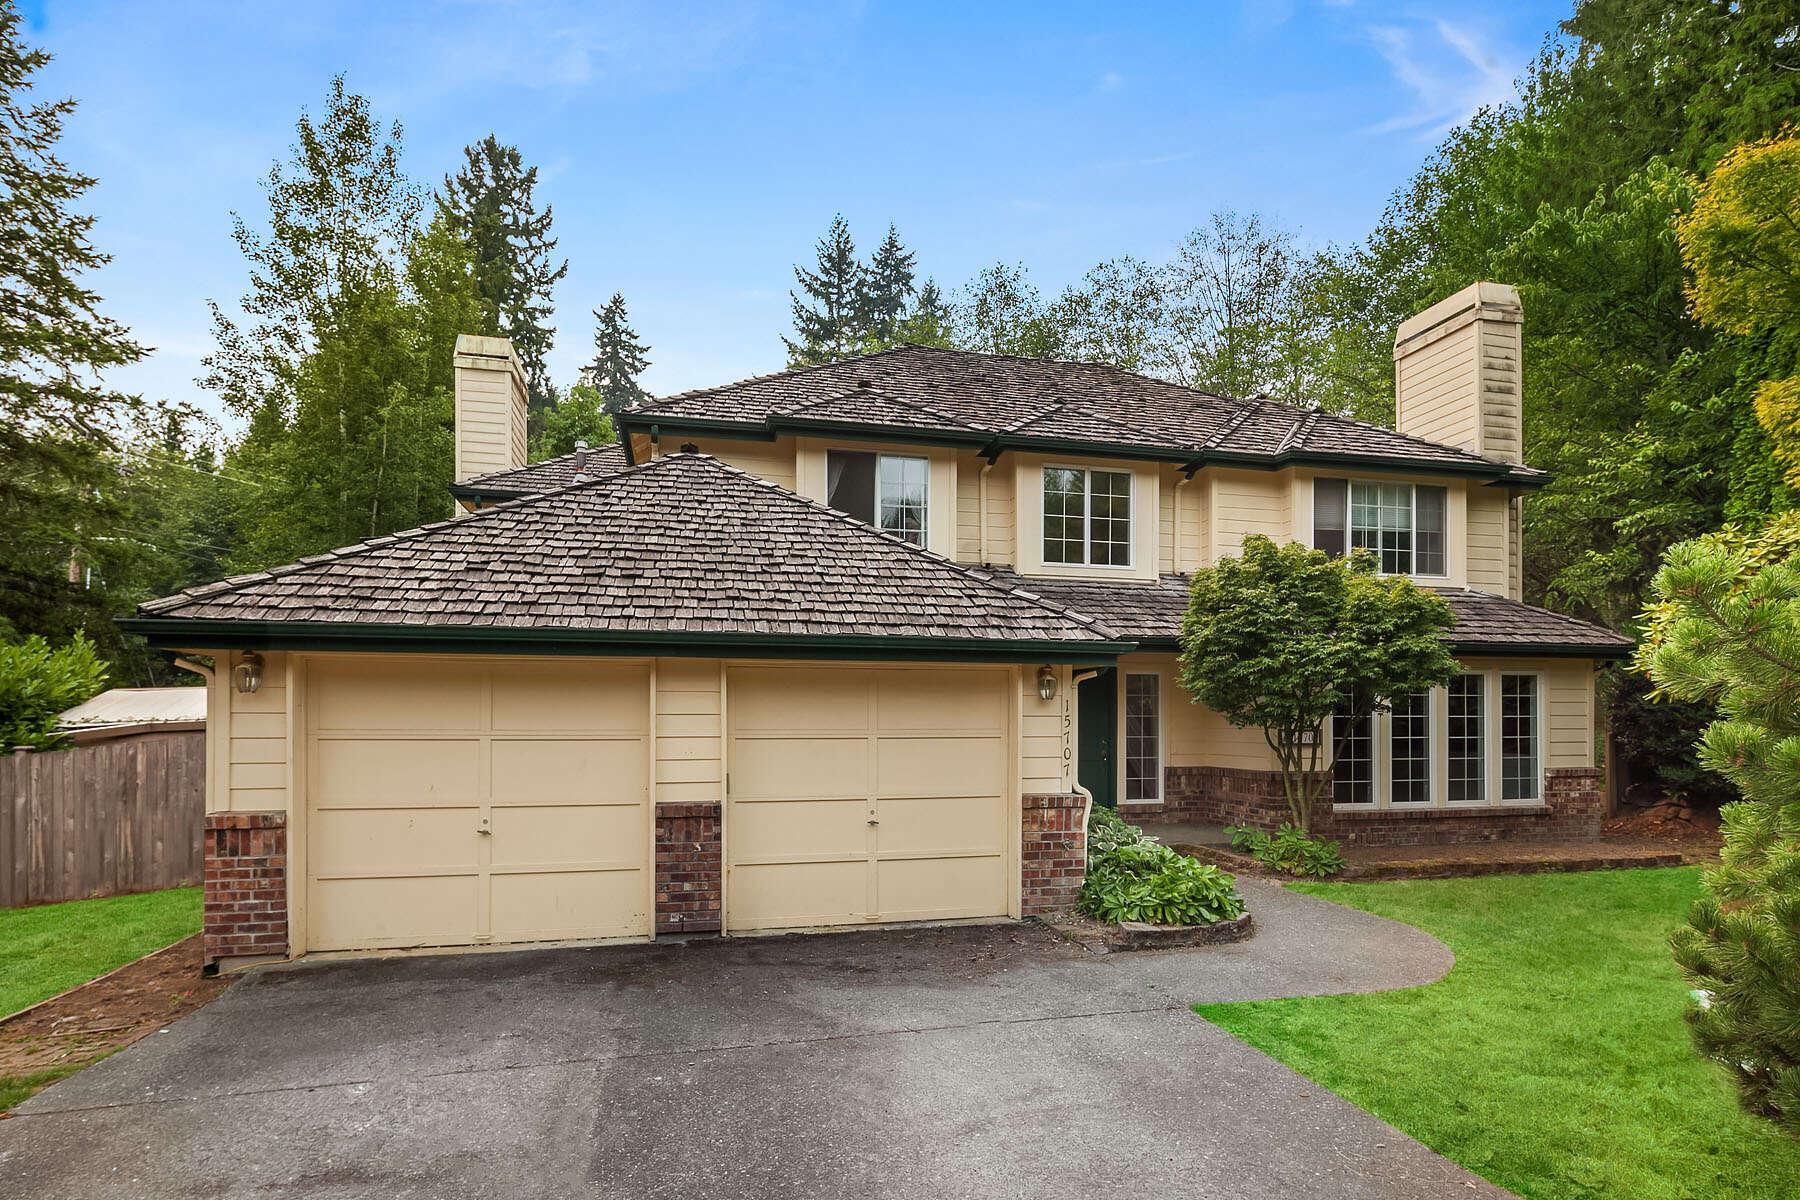 Single Family for Sale at 15707 99th Ave NE Bothell, Washington 98011 United States